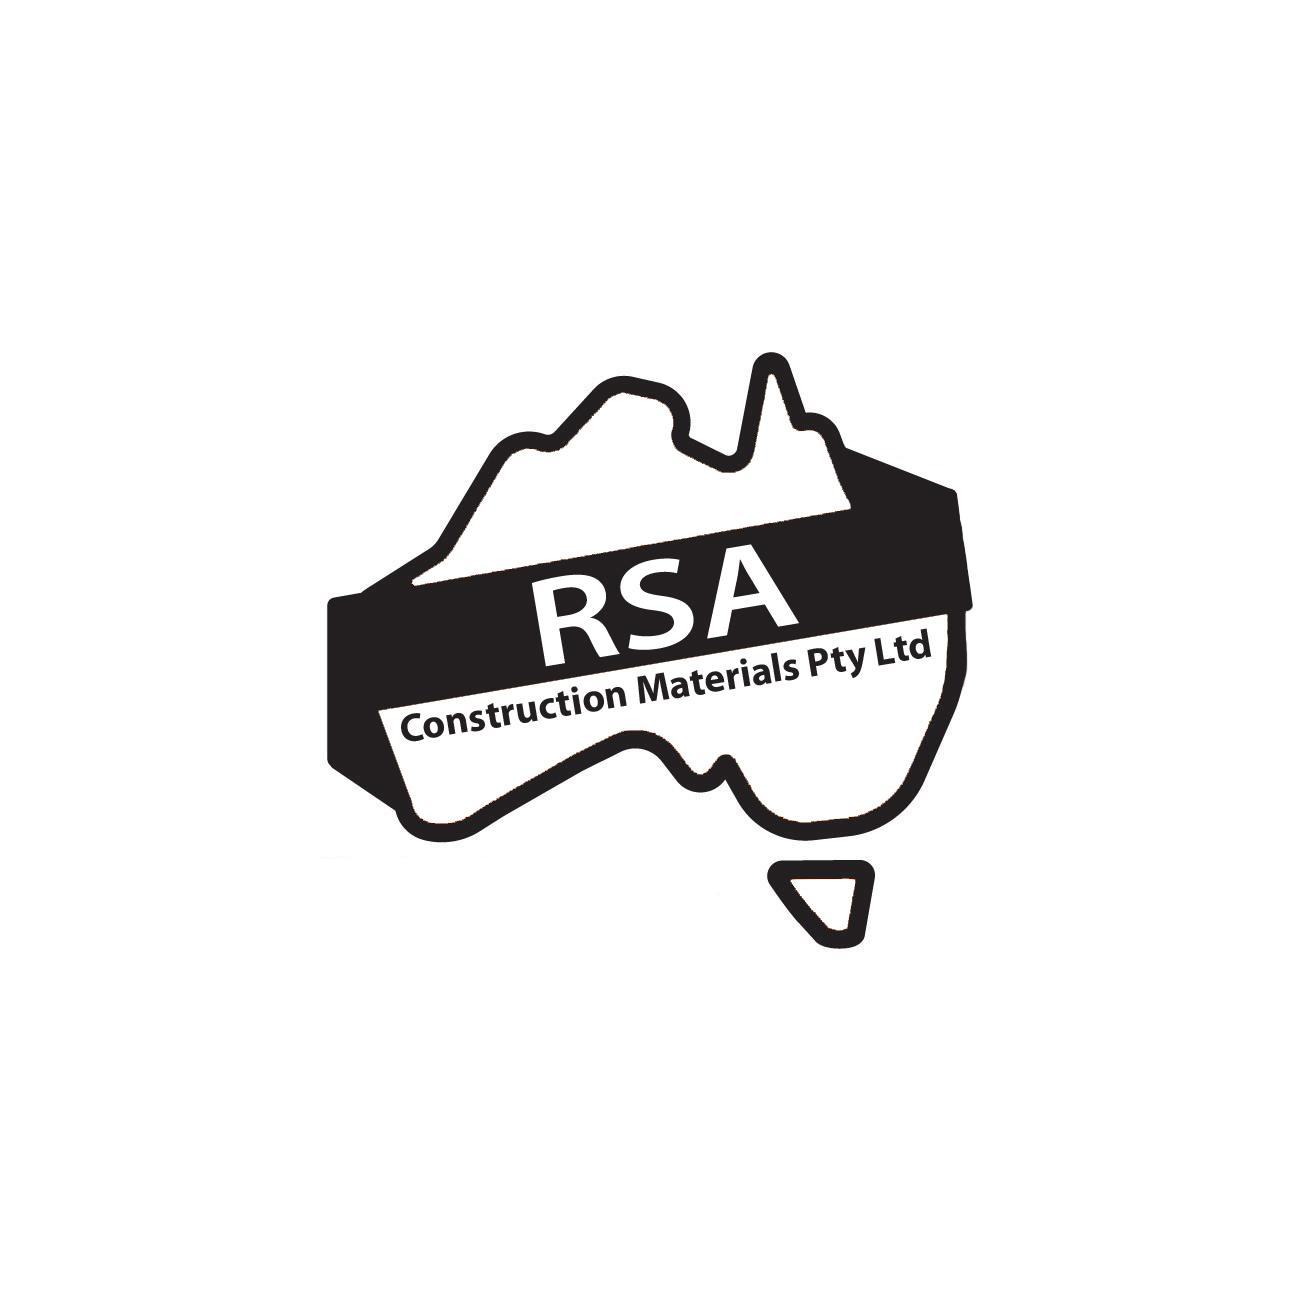 RSA Construction Materials Pty LTD